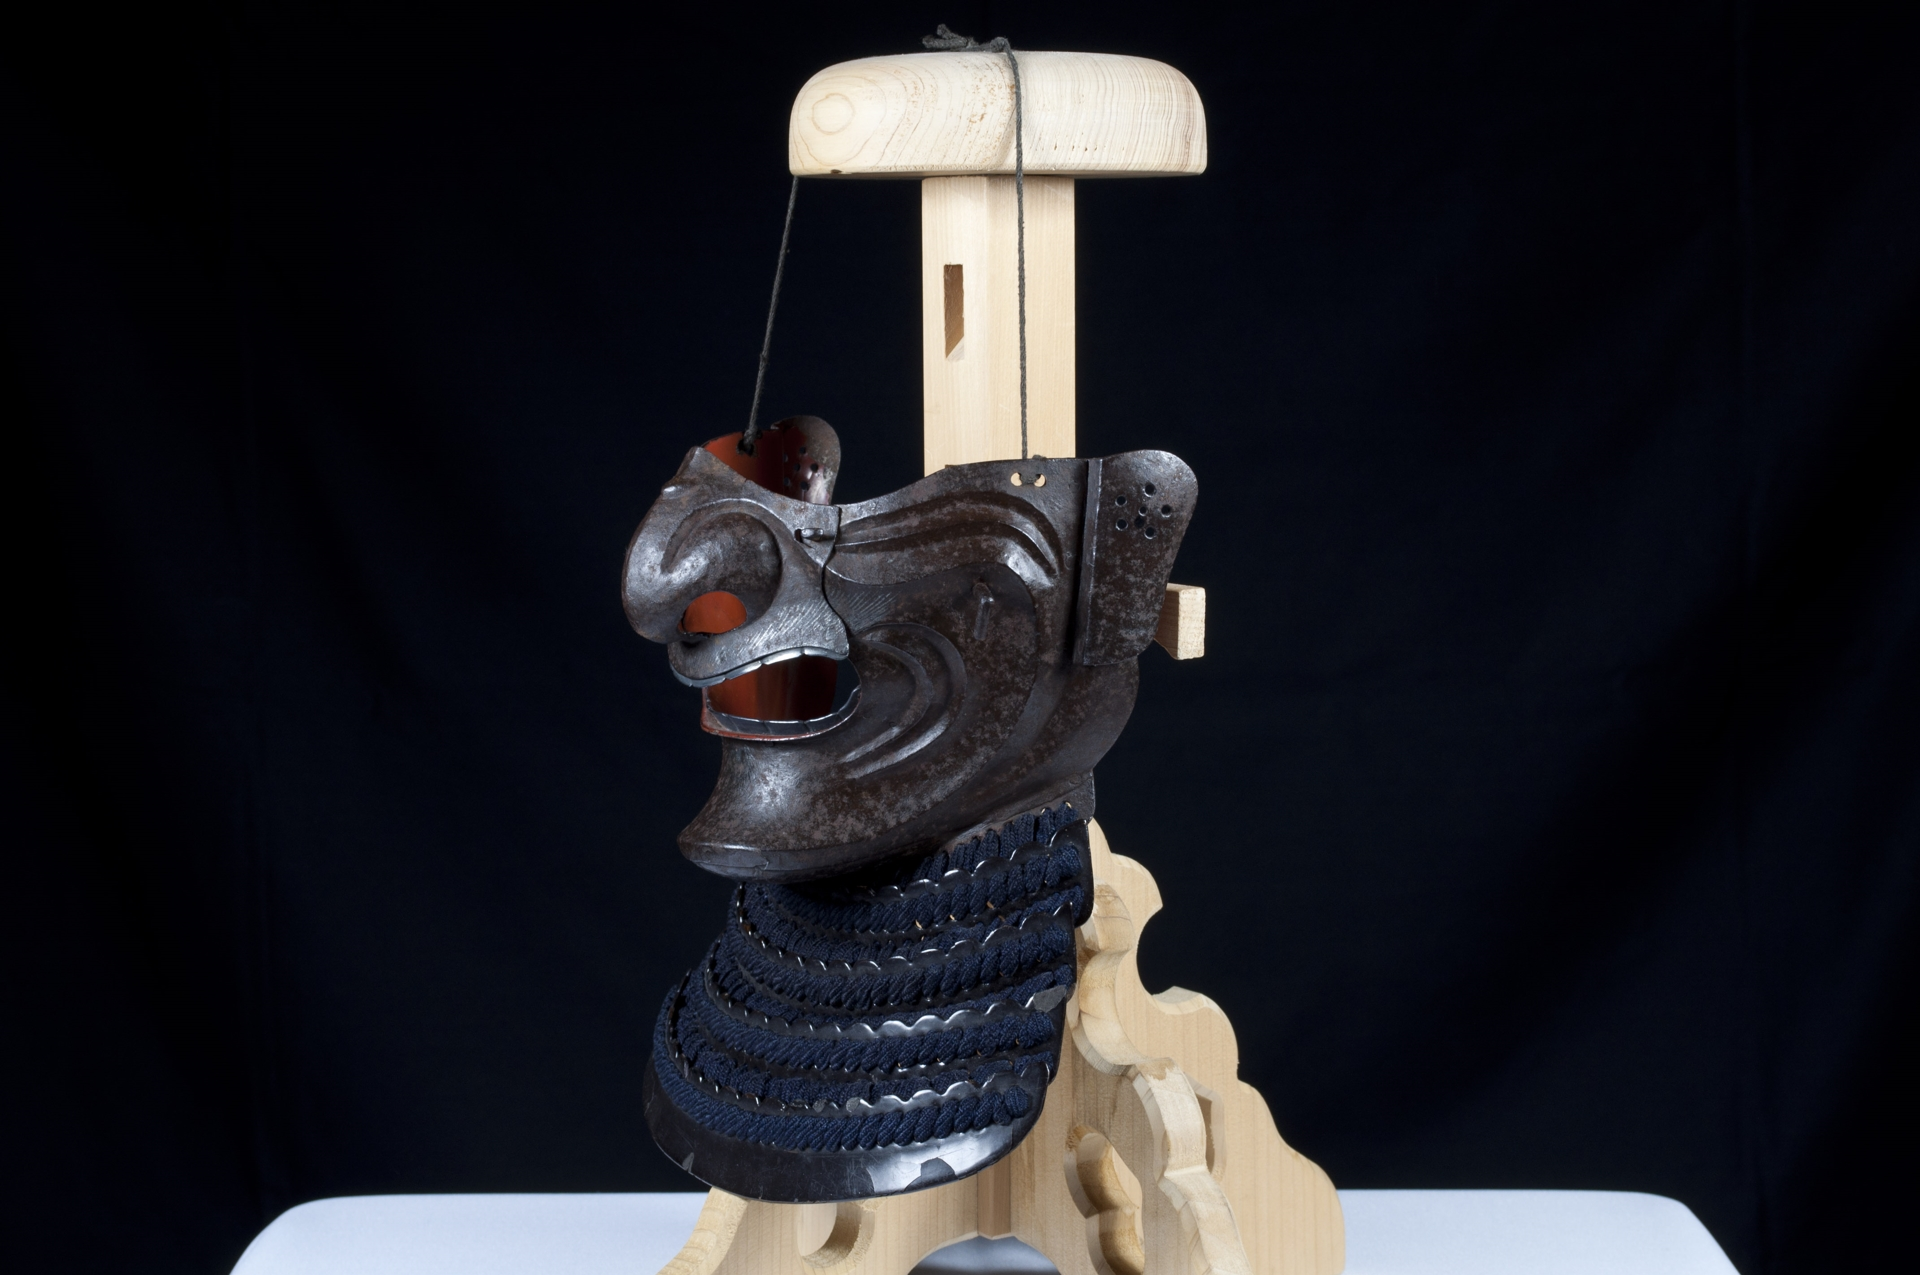 Menpo Reissei fer naturel Edo Armure Yoroi (4)